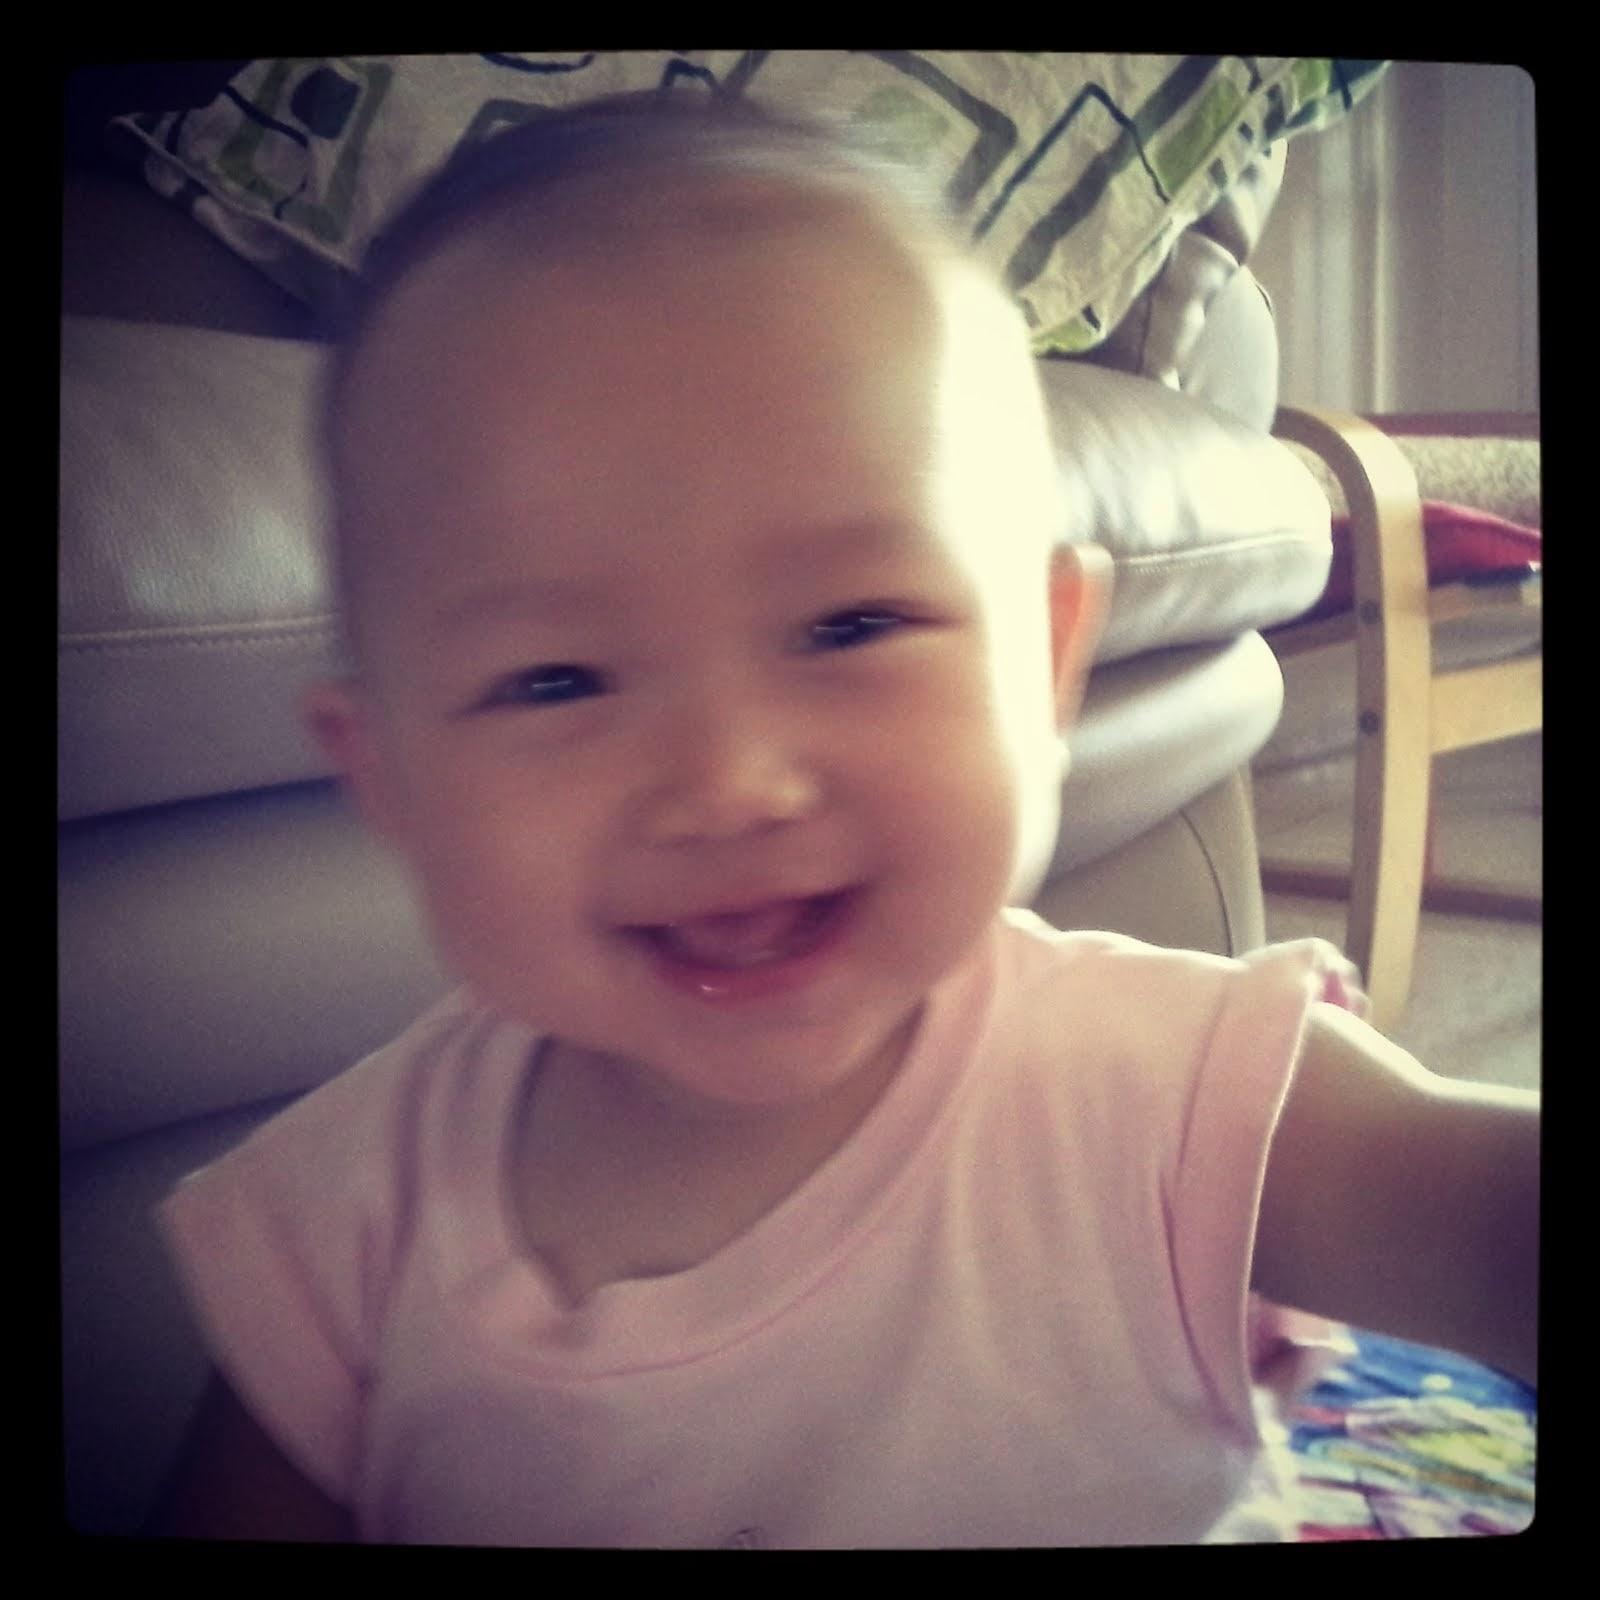 Daisy Amelia @ 10 months